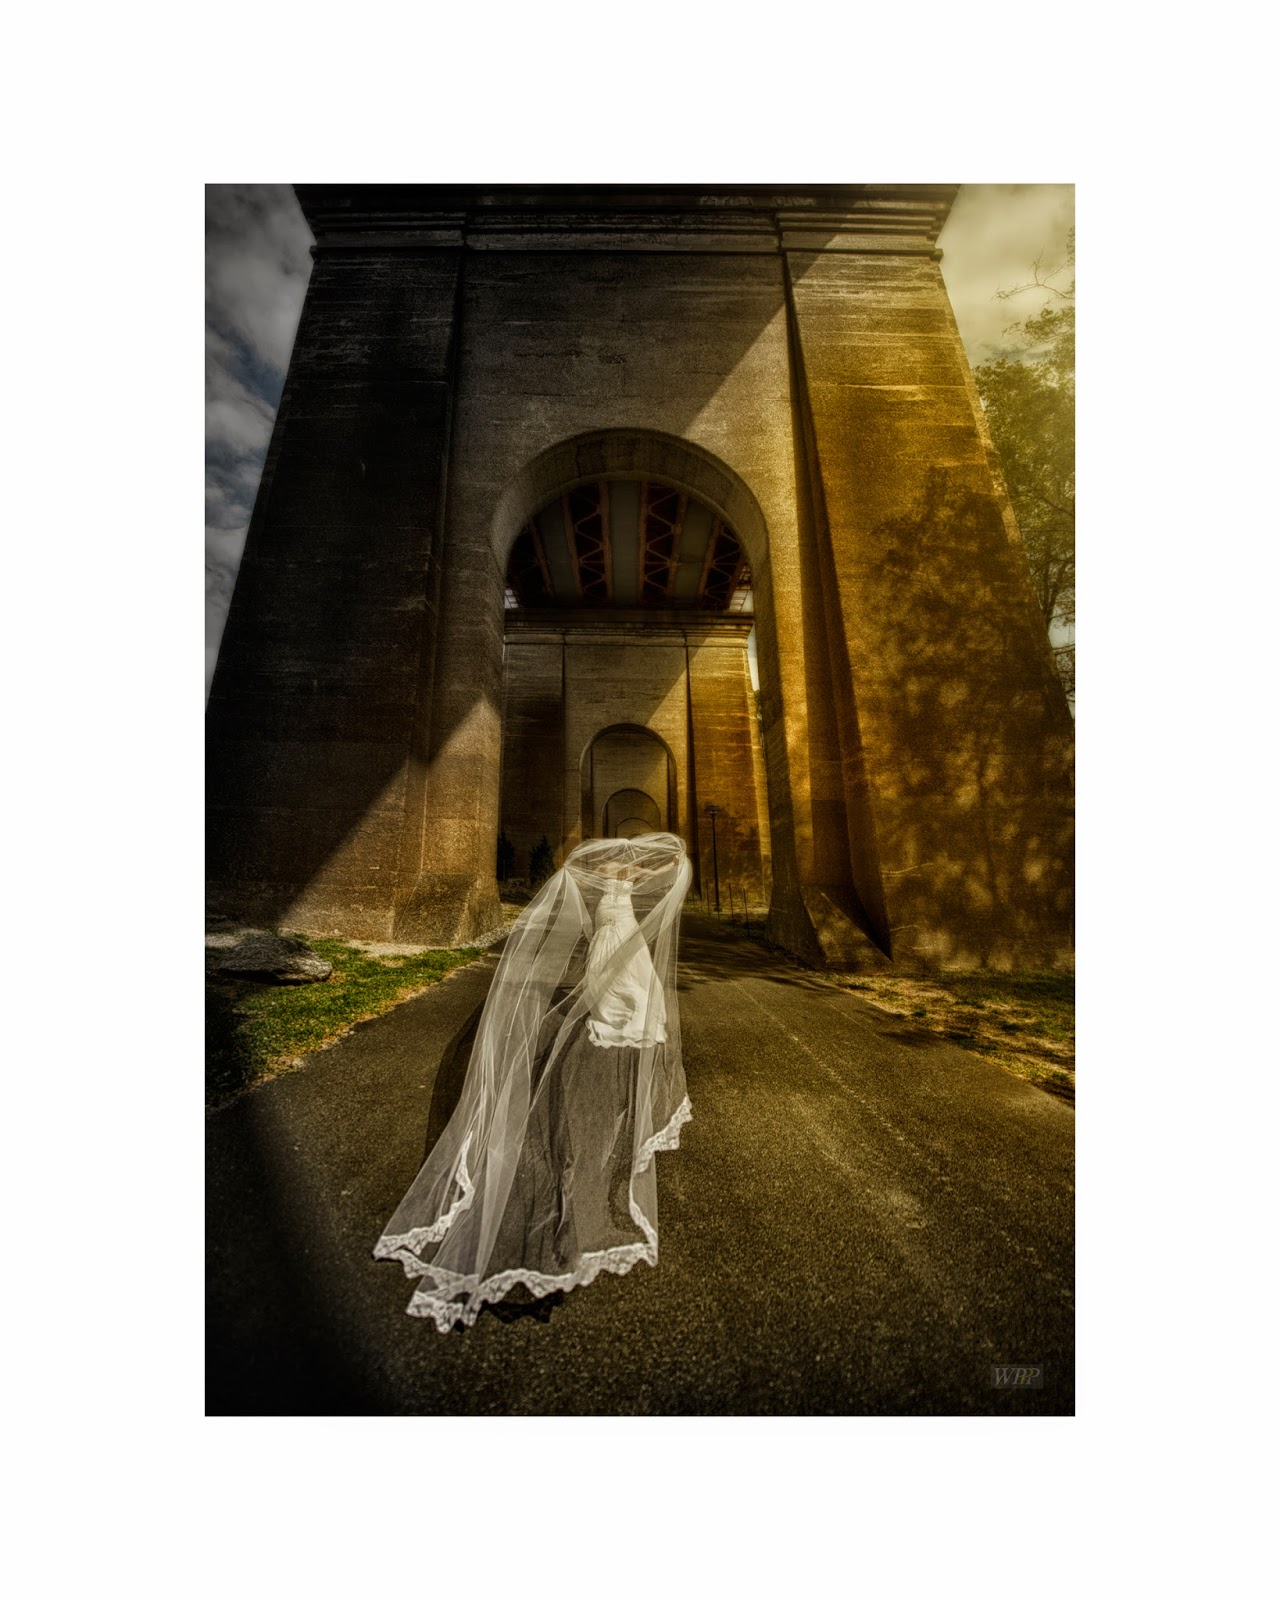 WPPP: September 2014 Photo Contest Winners